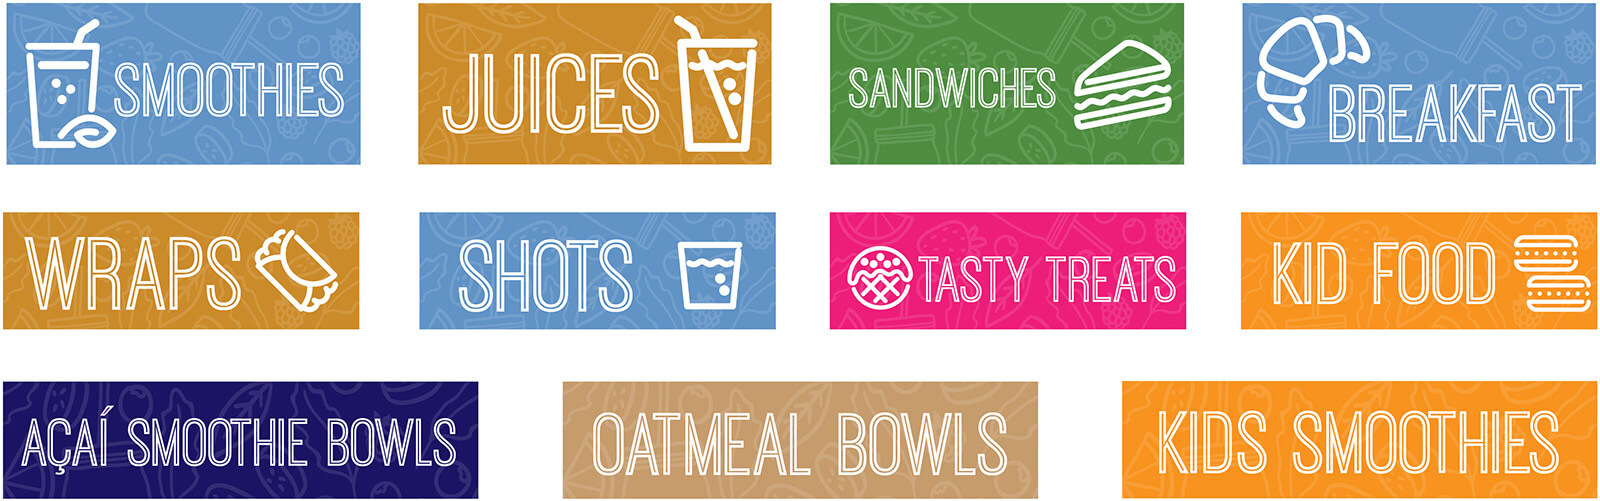 juiceria, smoothie, smoothie bar, juices, cafe, food, sandwiches, goose creek, smoothie franchise